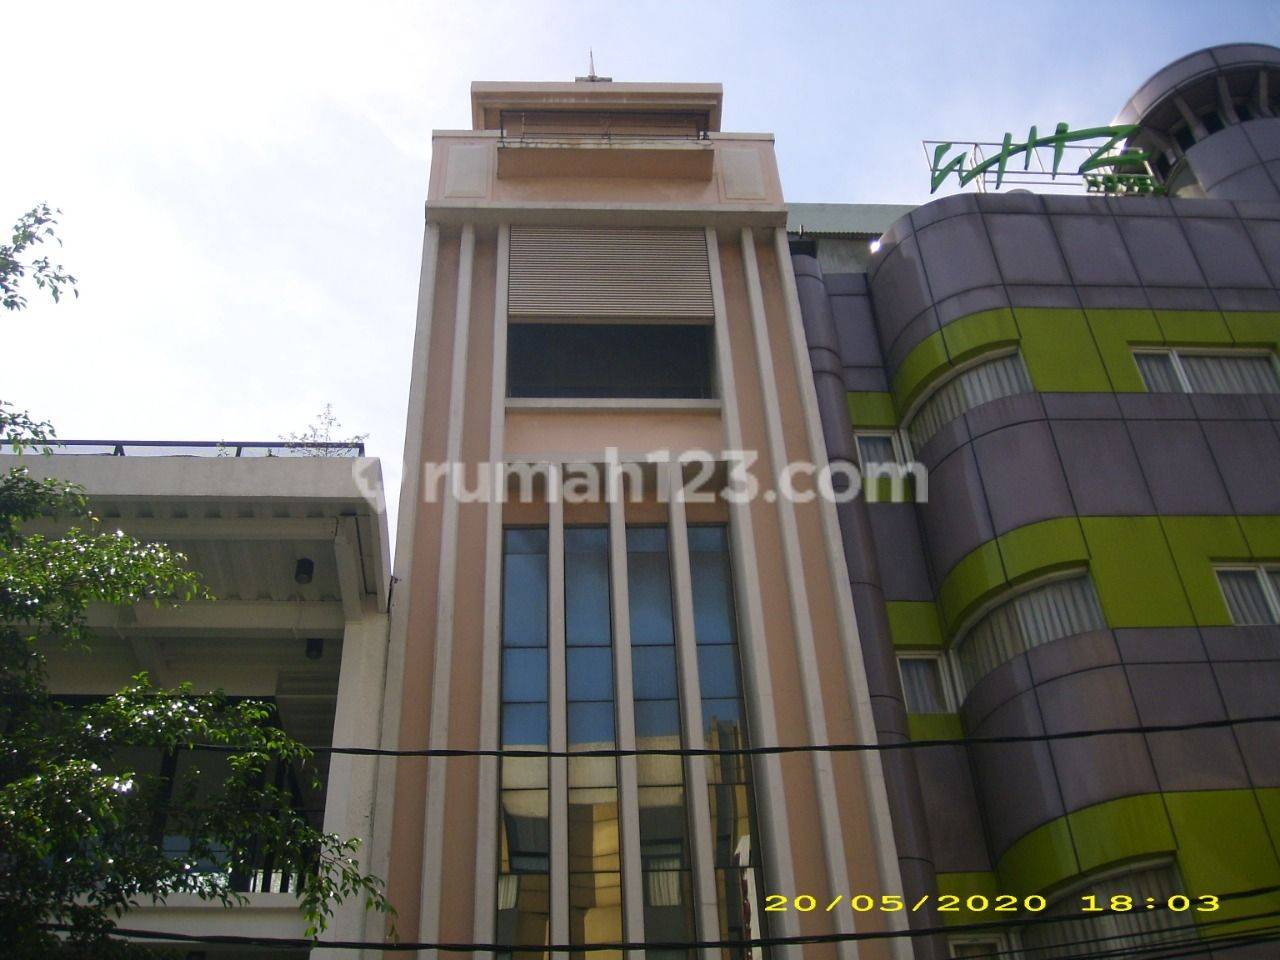 Gedung kantor 5 lantai luas 136 m2 Blok M Kebayoran Baru Jaksel